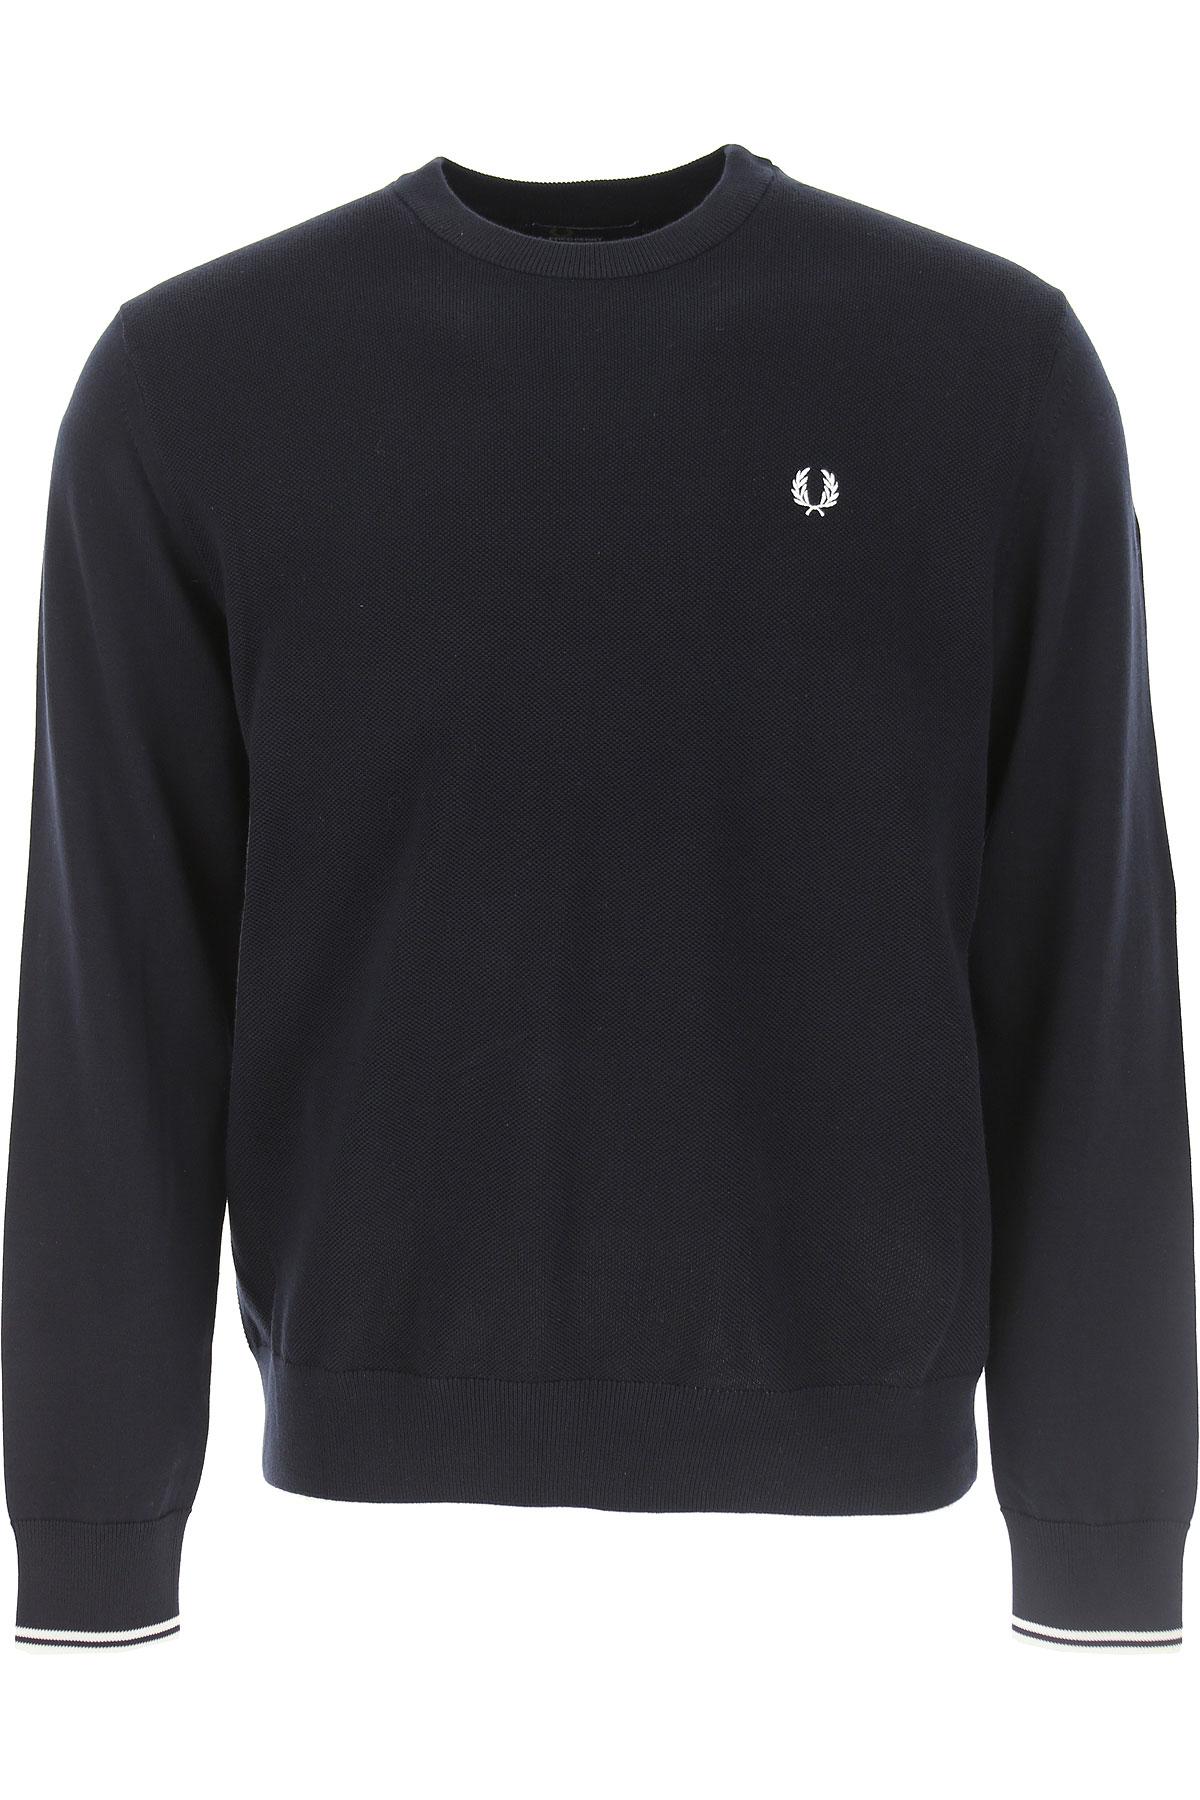 Fred Perry Sweater Voor Mannen, Donker Blauw Marine, Katoen, 2019, L M S XL XXL